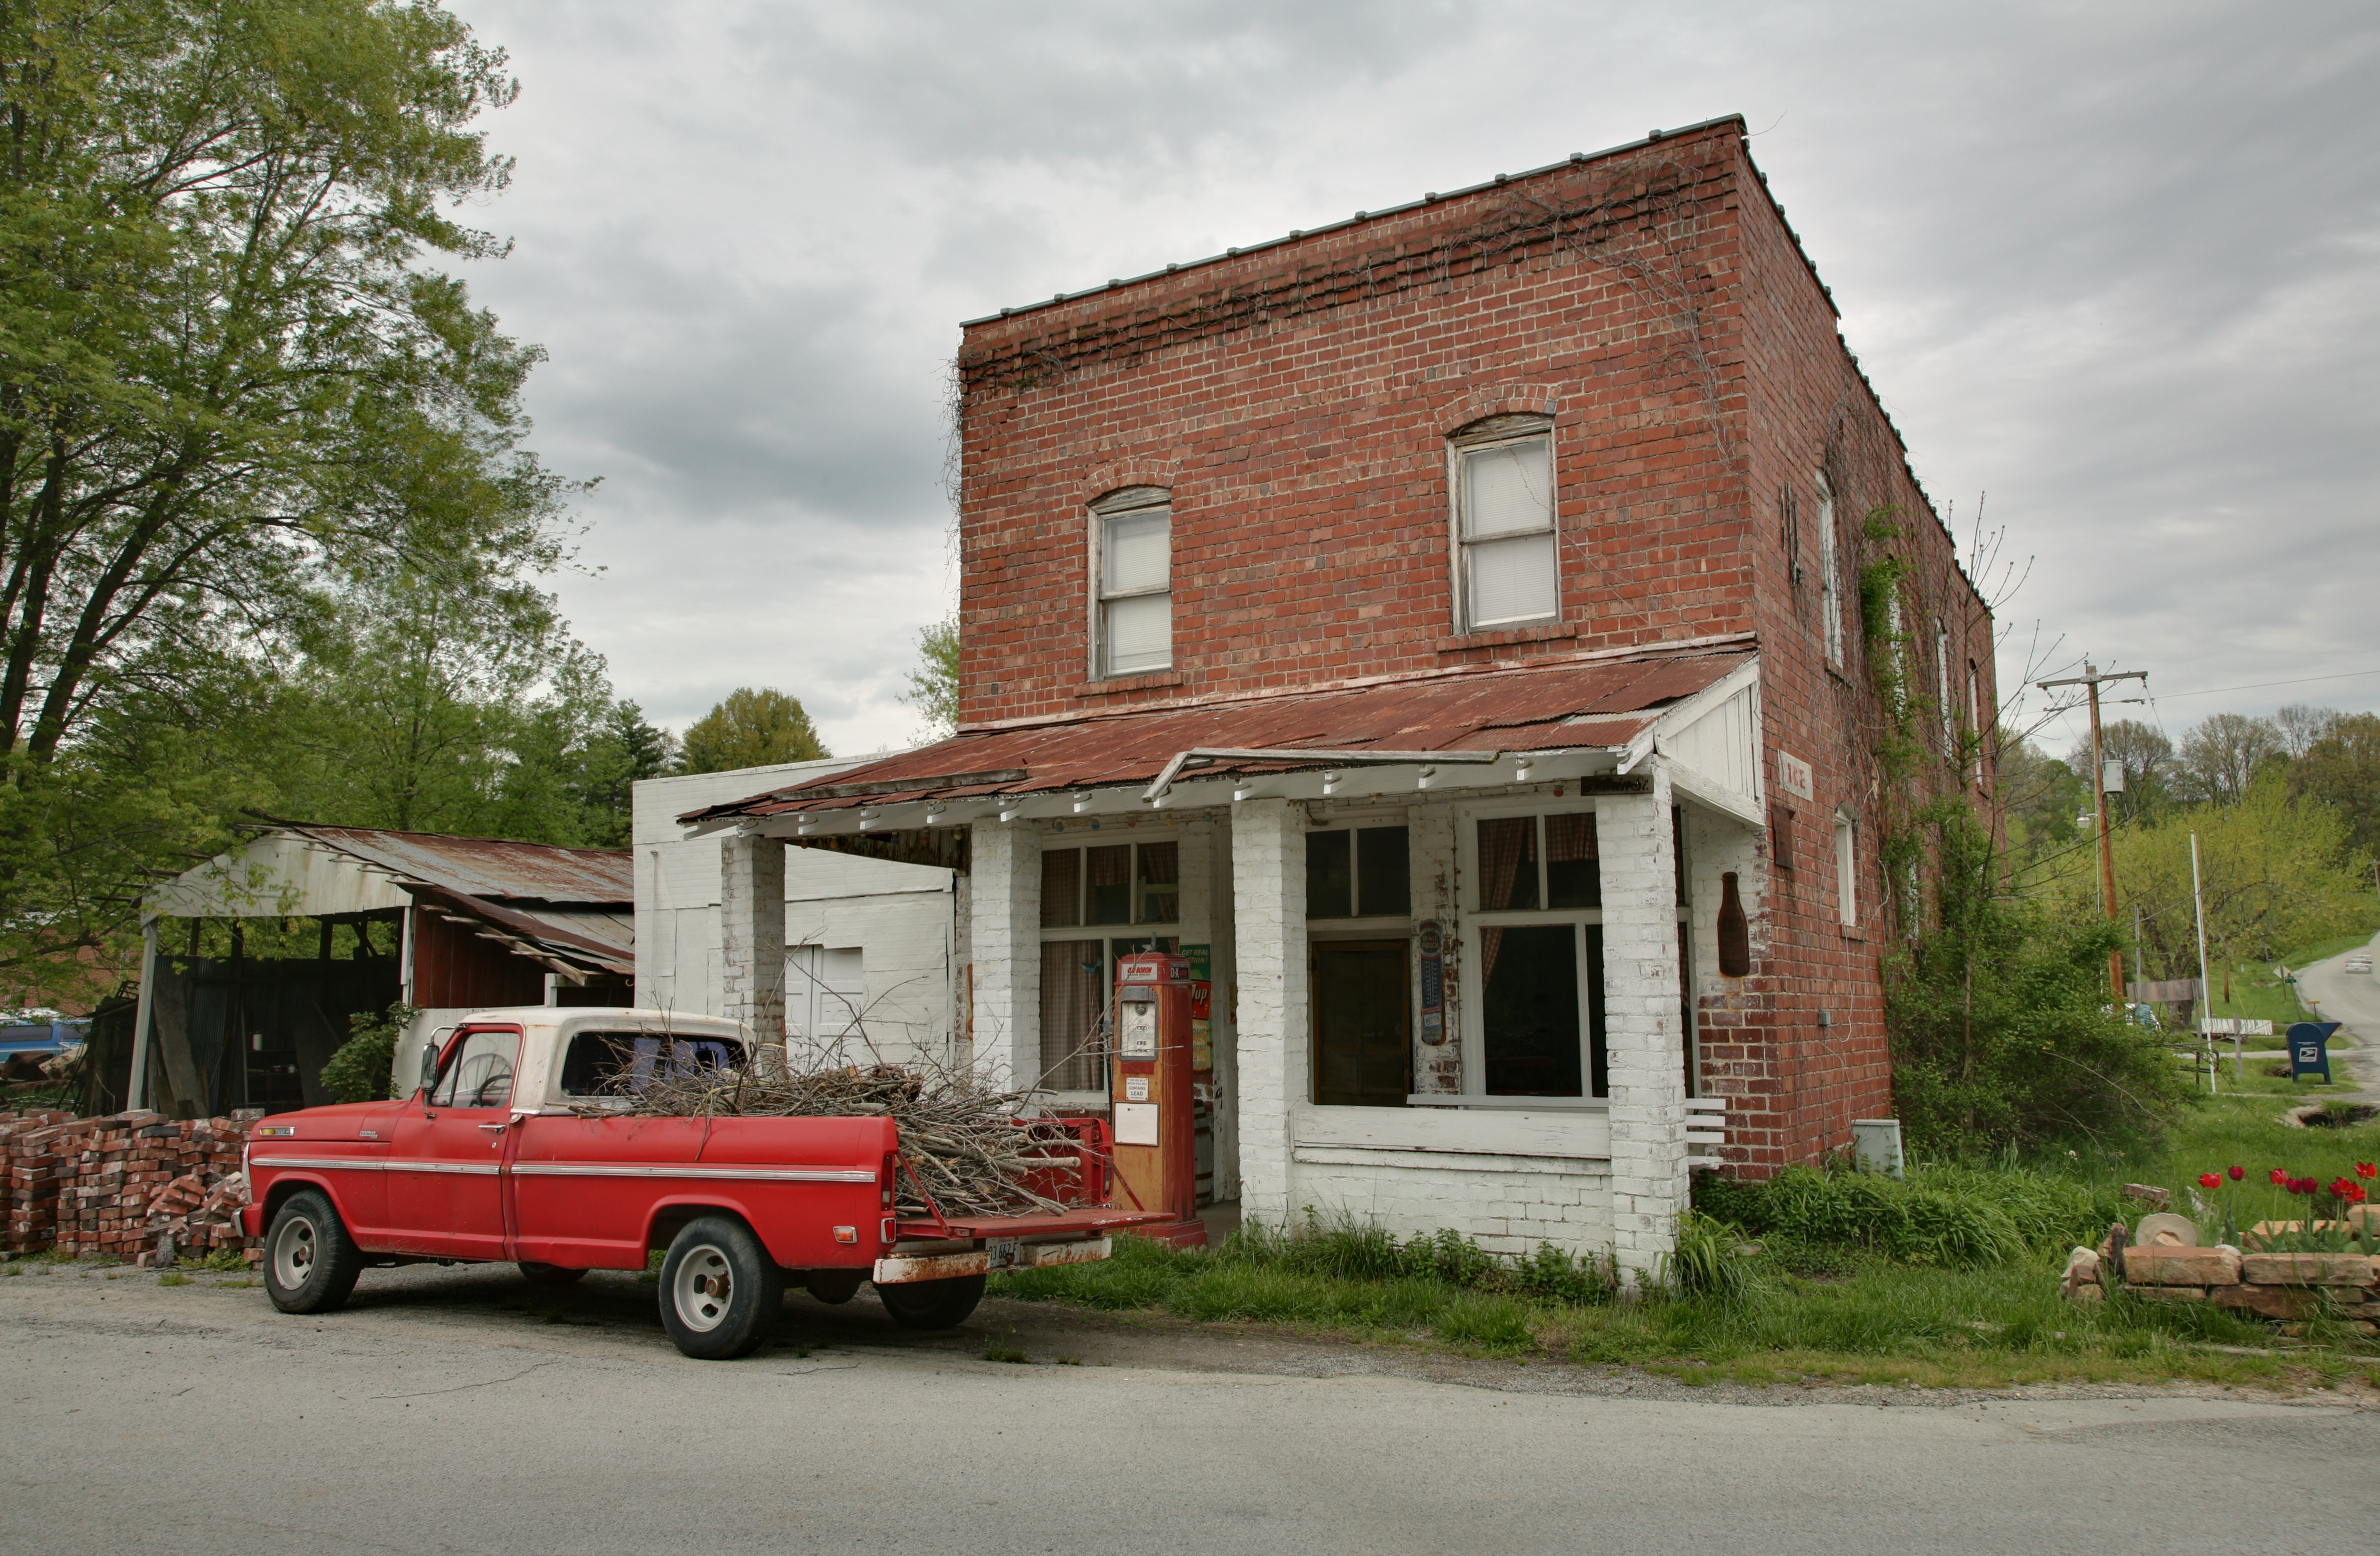 Older Homes For Sale In Apilachian Cola Florida